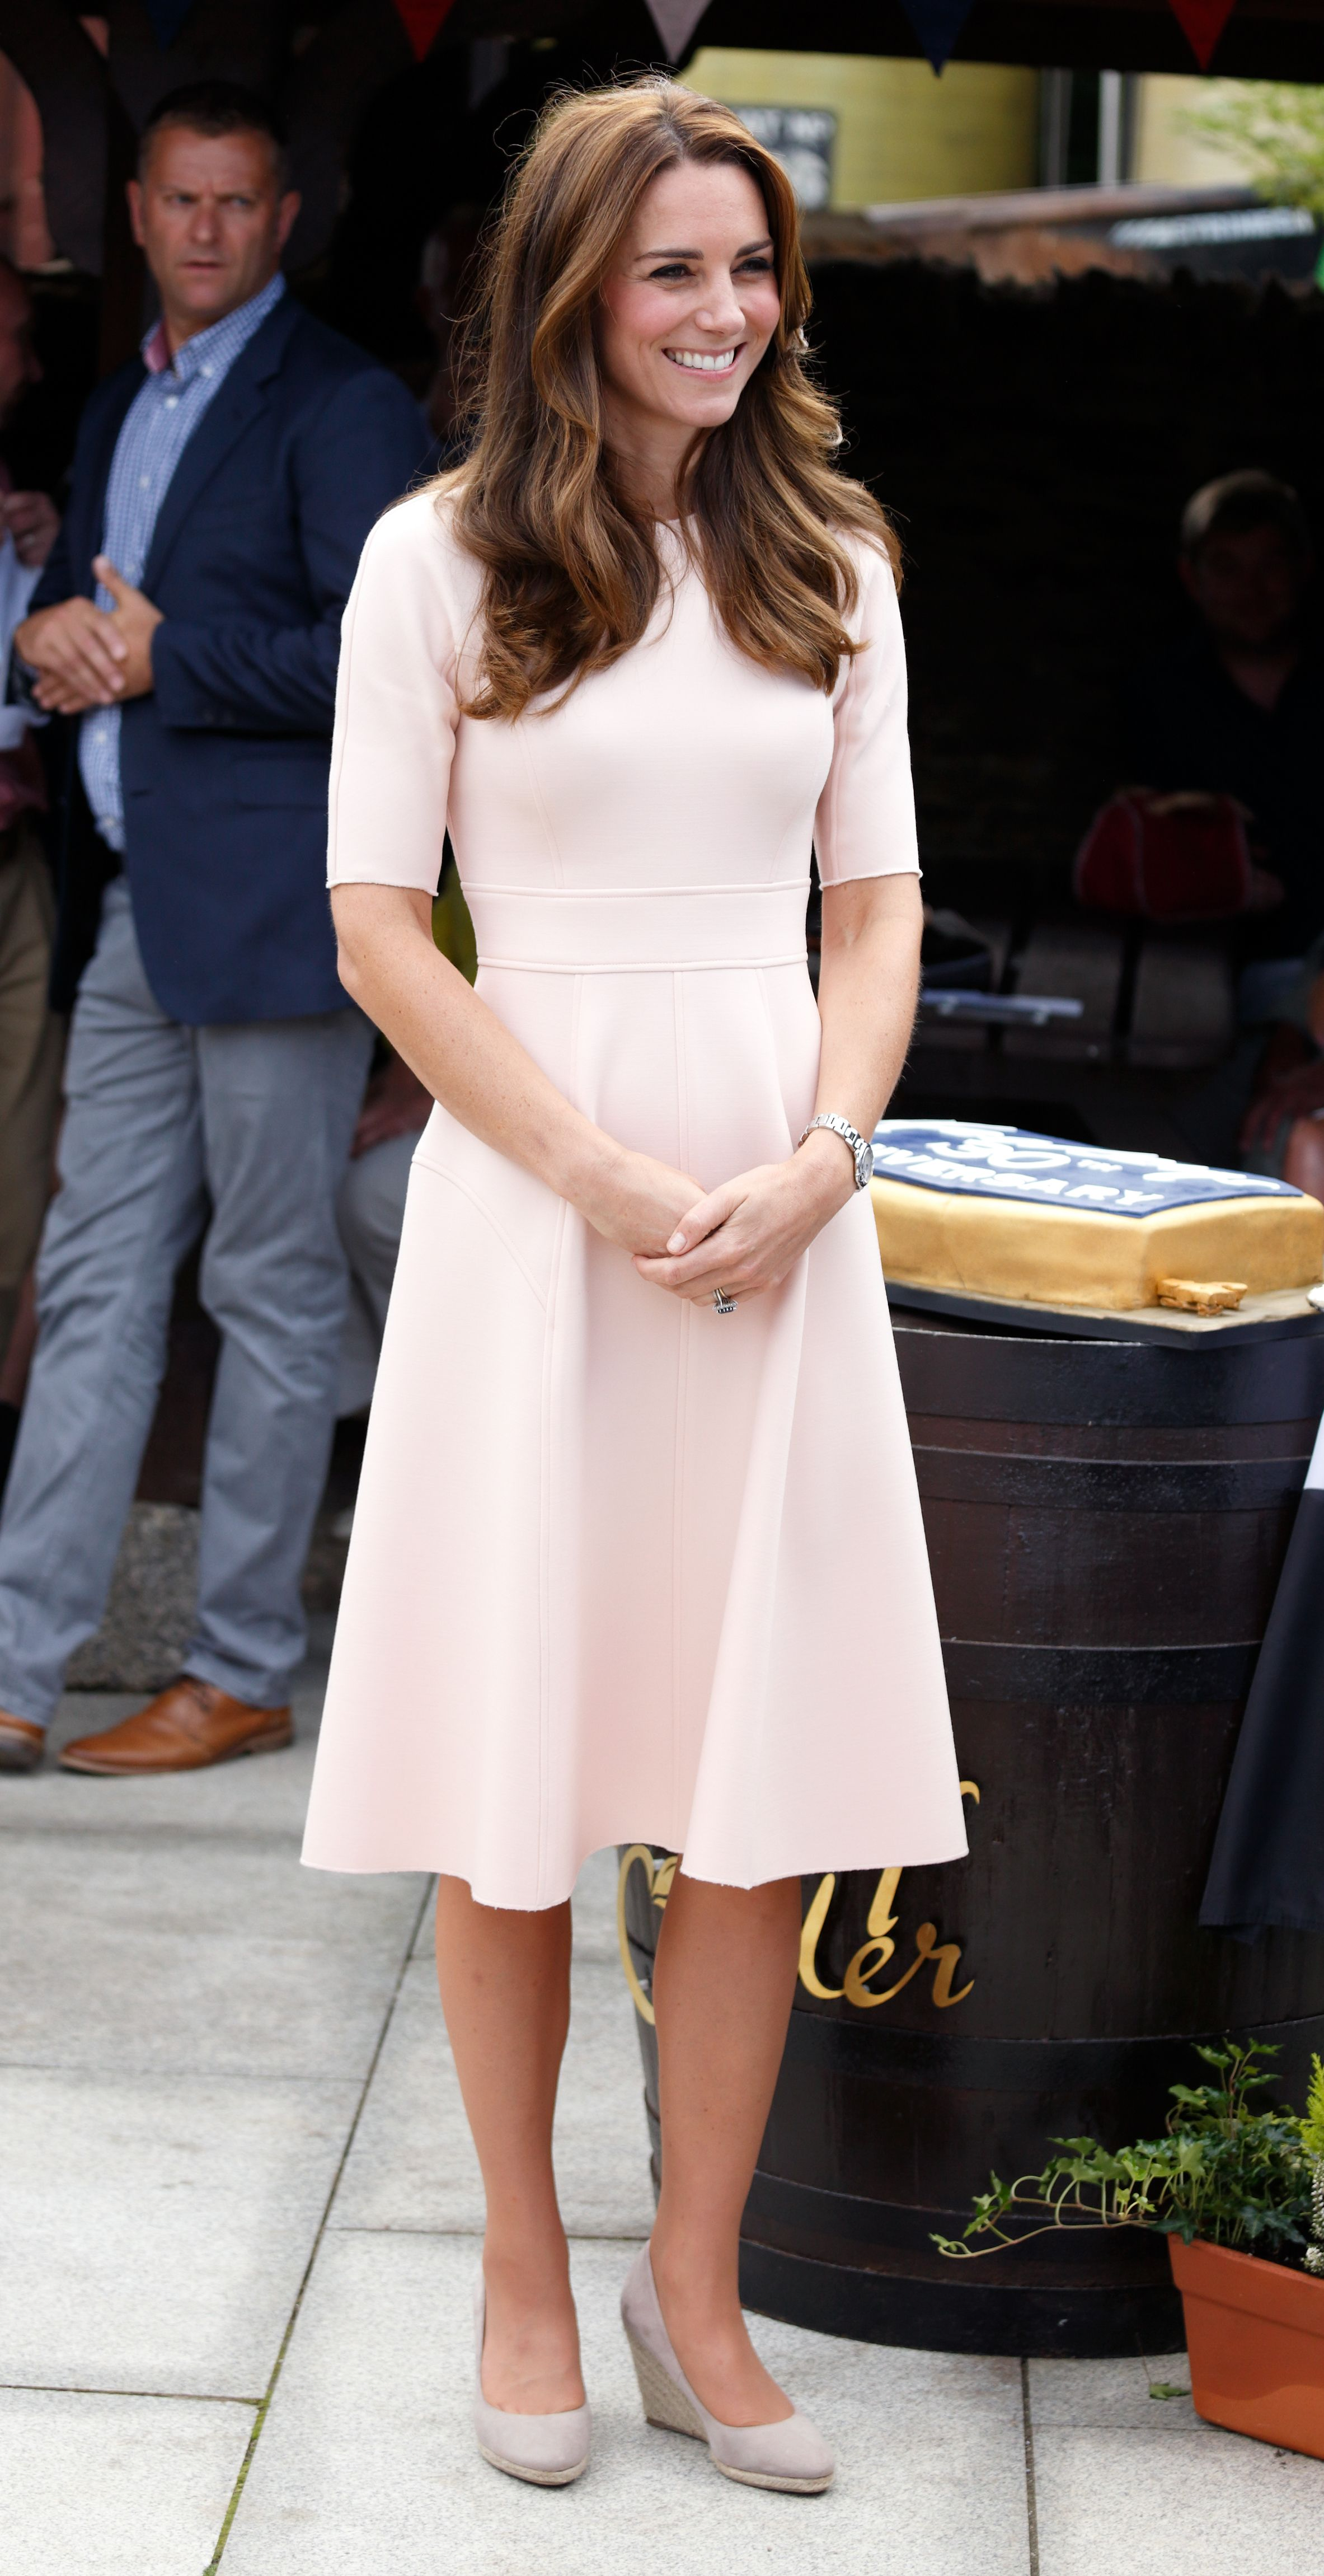 Kate Middleton Duchess Of Cambridge : middleton, duchess, cambridge, Middleton's, Controversial, Moments, Royal